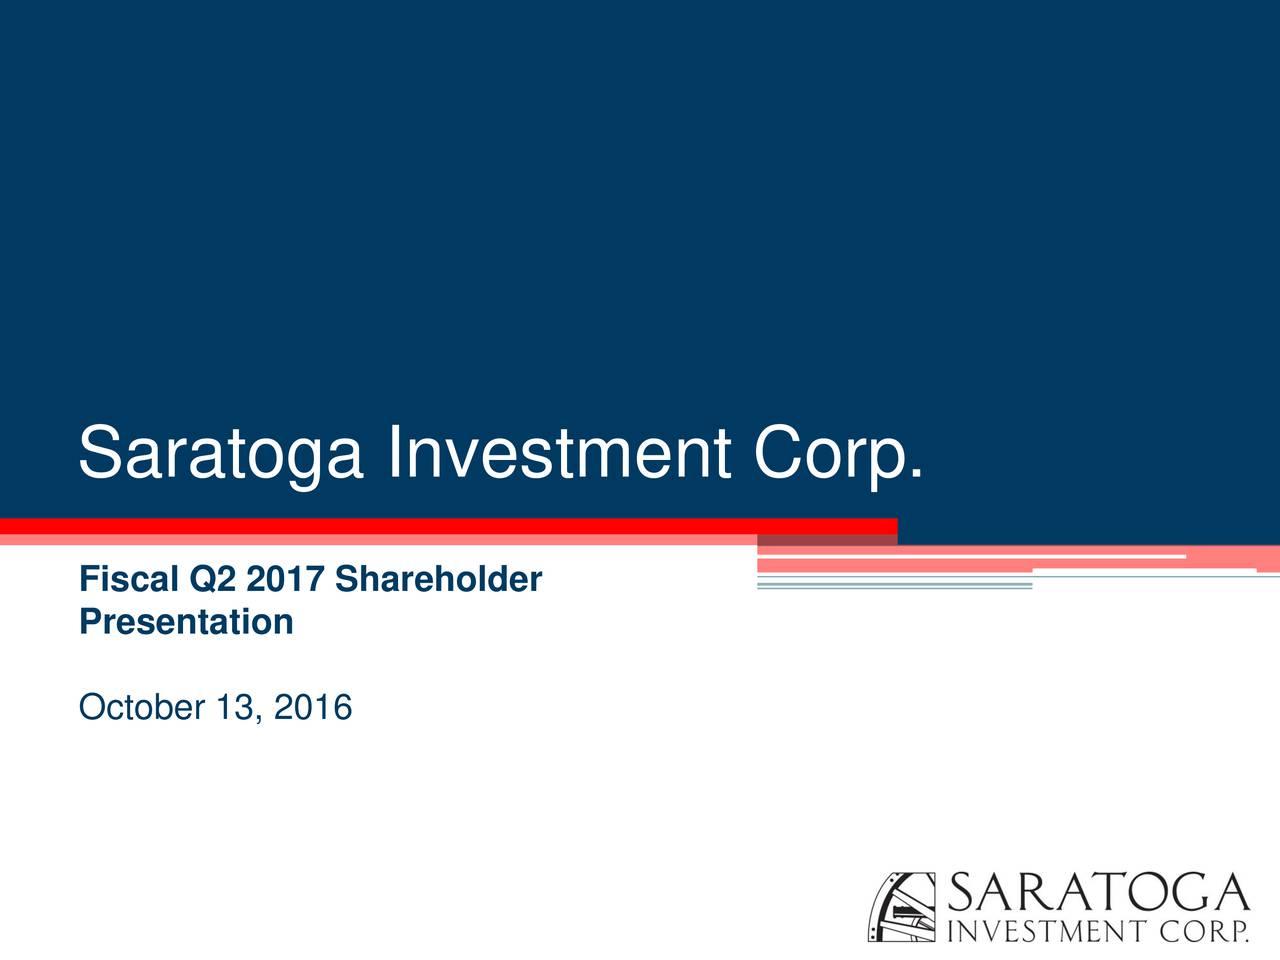 Fiscal Q2 2017 Shareholder Presentation October 13, 2016